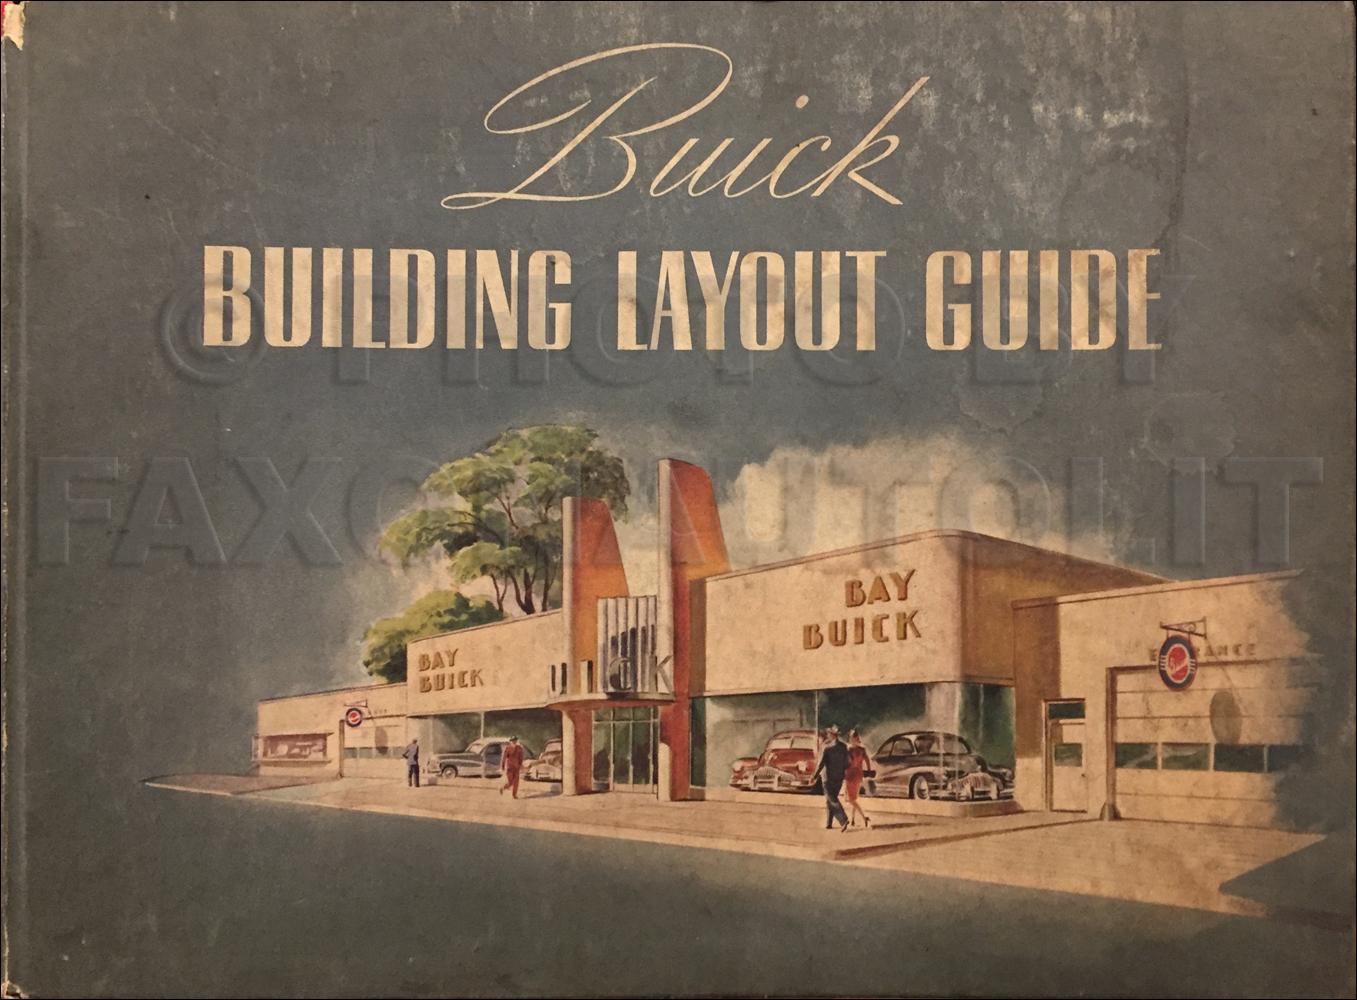 1946BuickBuildingLayoutGuide.jpg&f=1